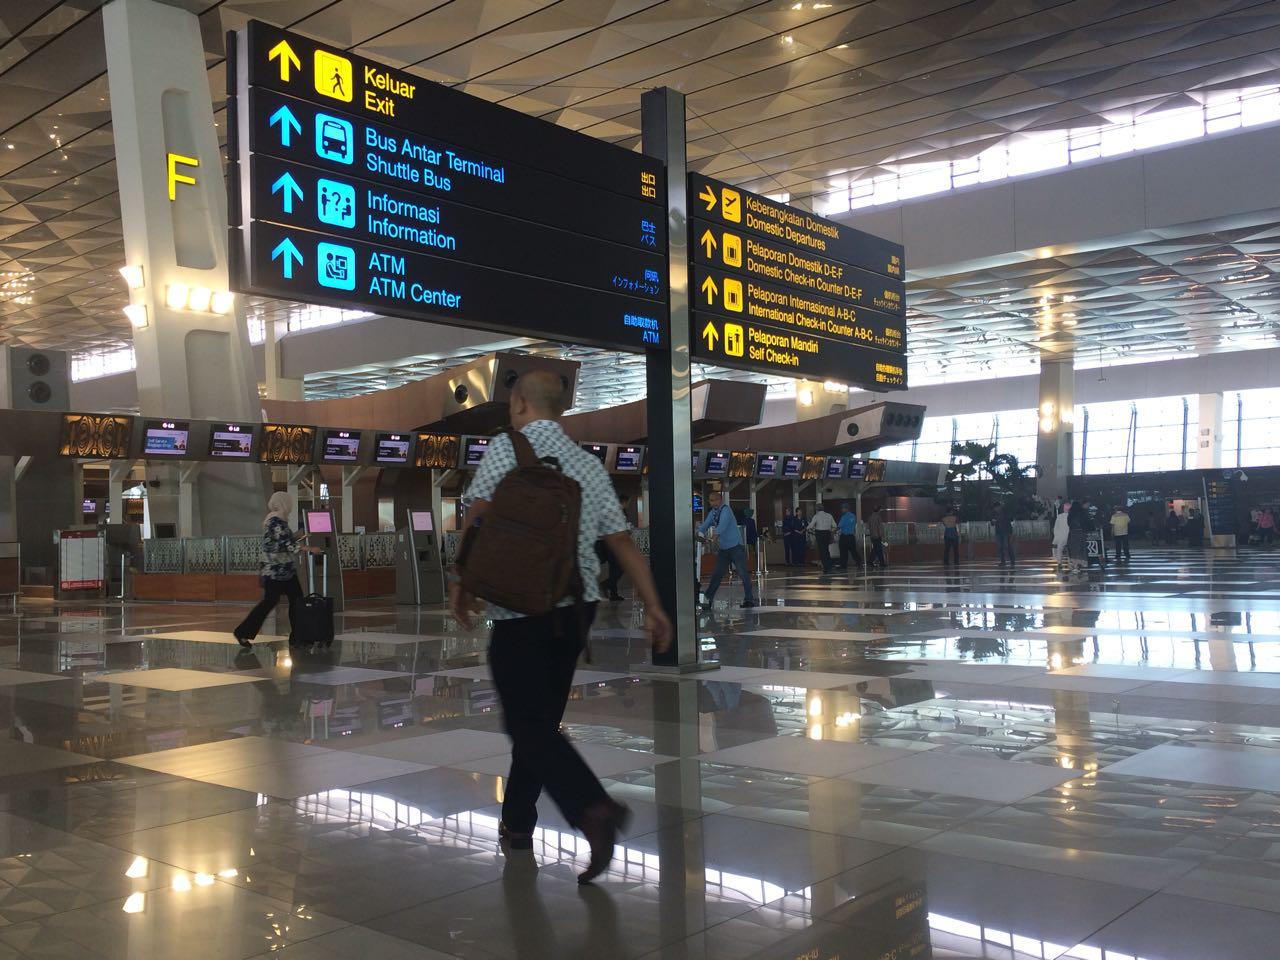 https: img.okezone.com content 2020 01 24 320 2157980 ap-i-pede-pembangunan-bandara-internasional-yogyakarta-tepat-waktu-MzDKD7W2wU.jpg